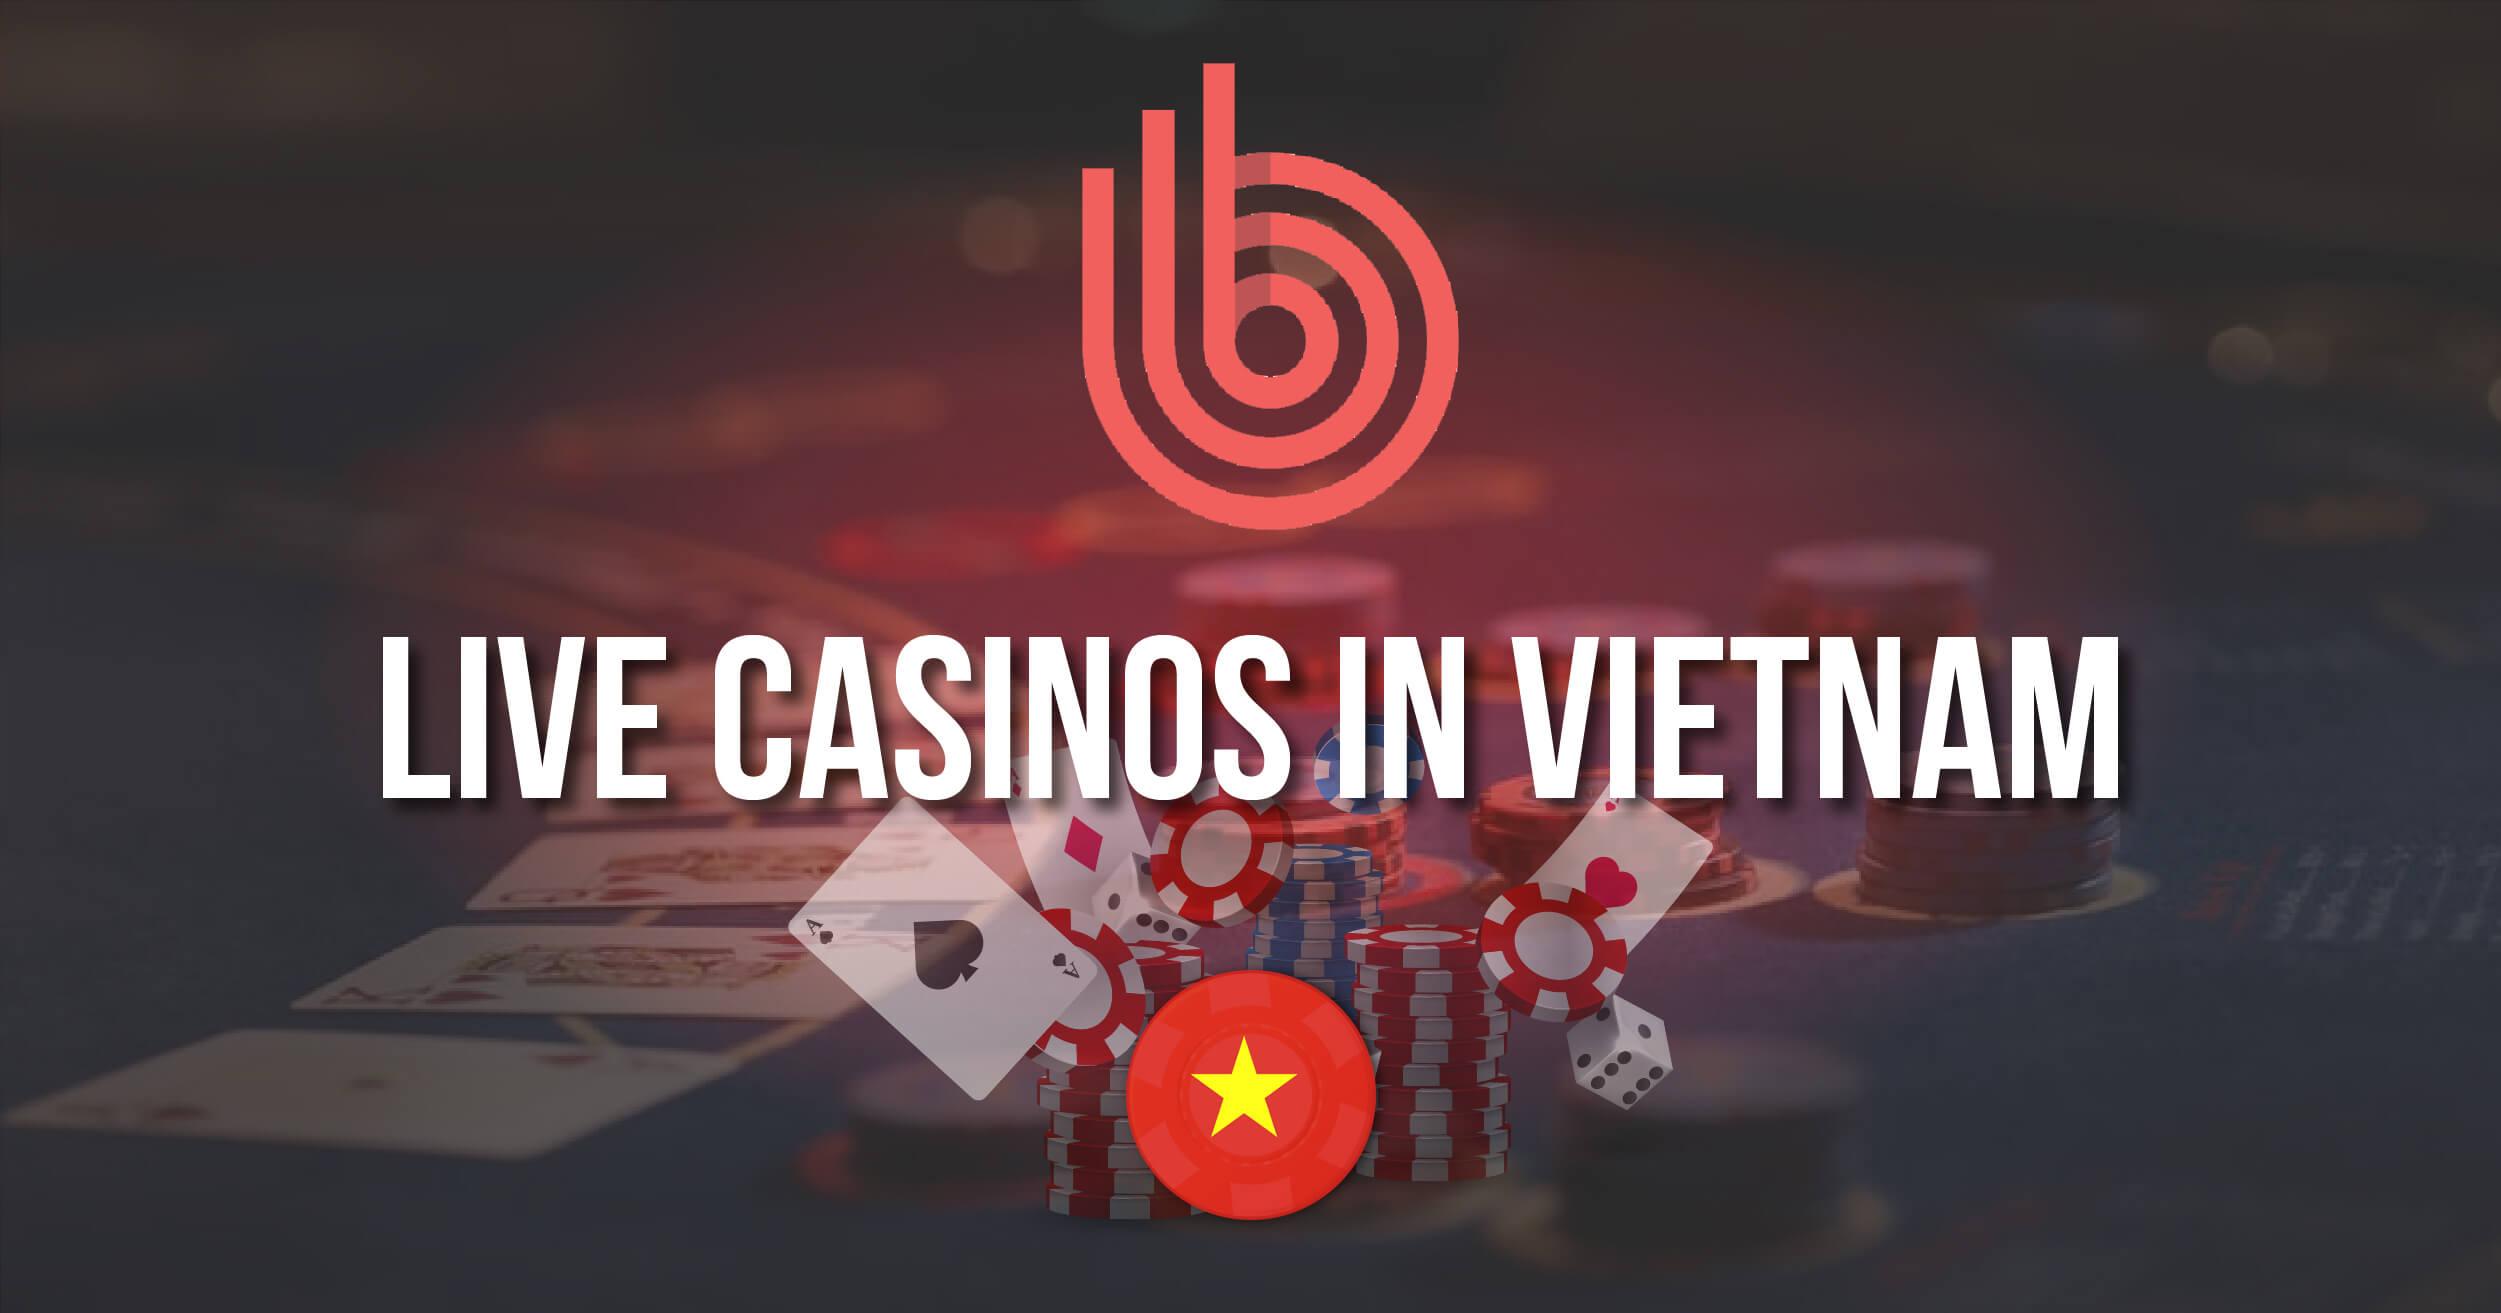 Best Live Casinos In Vietnam